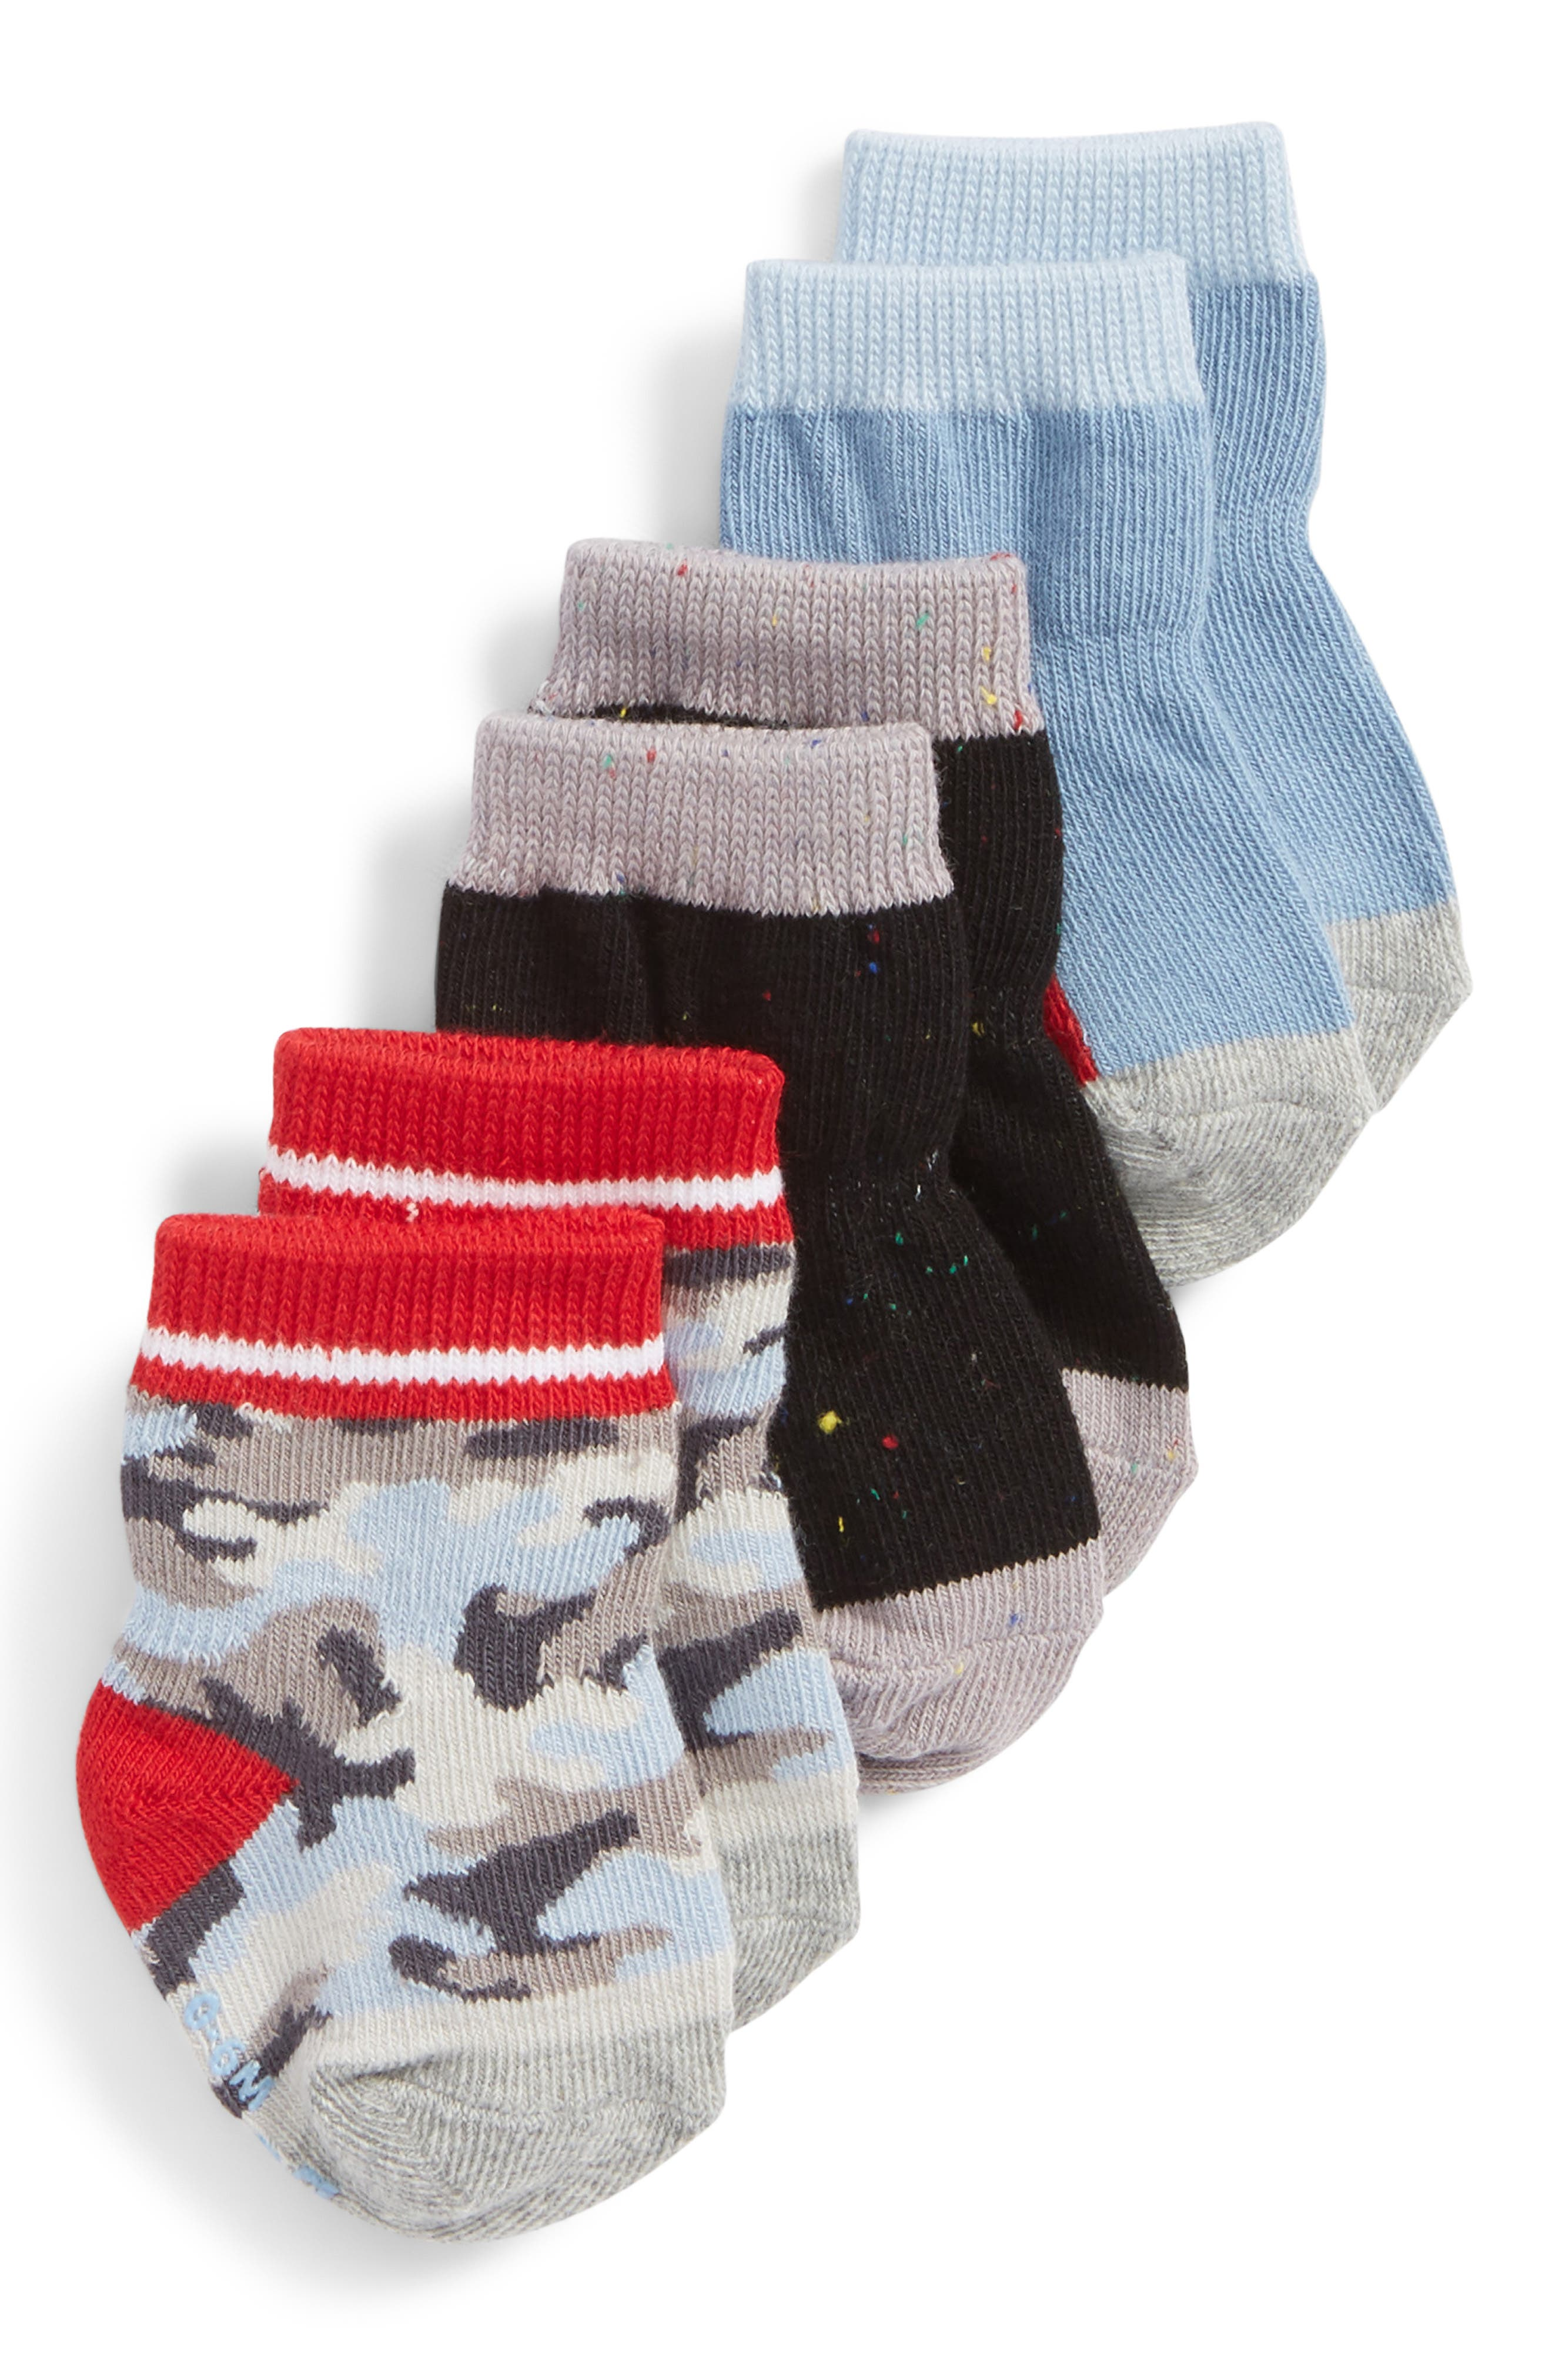 Camo 3-Pack Socks,                             Main thumbnail 1, color,                             GRAY/ BLUE/ RED